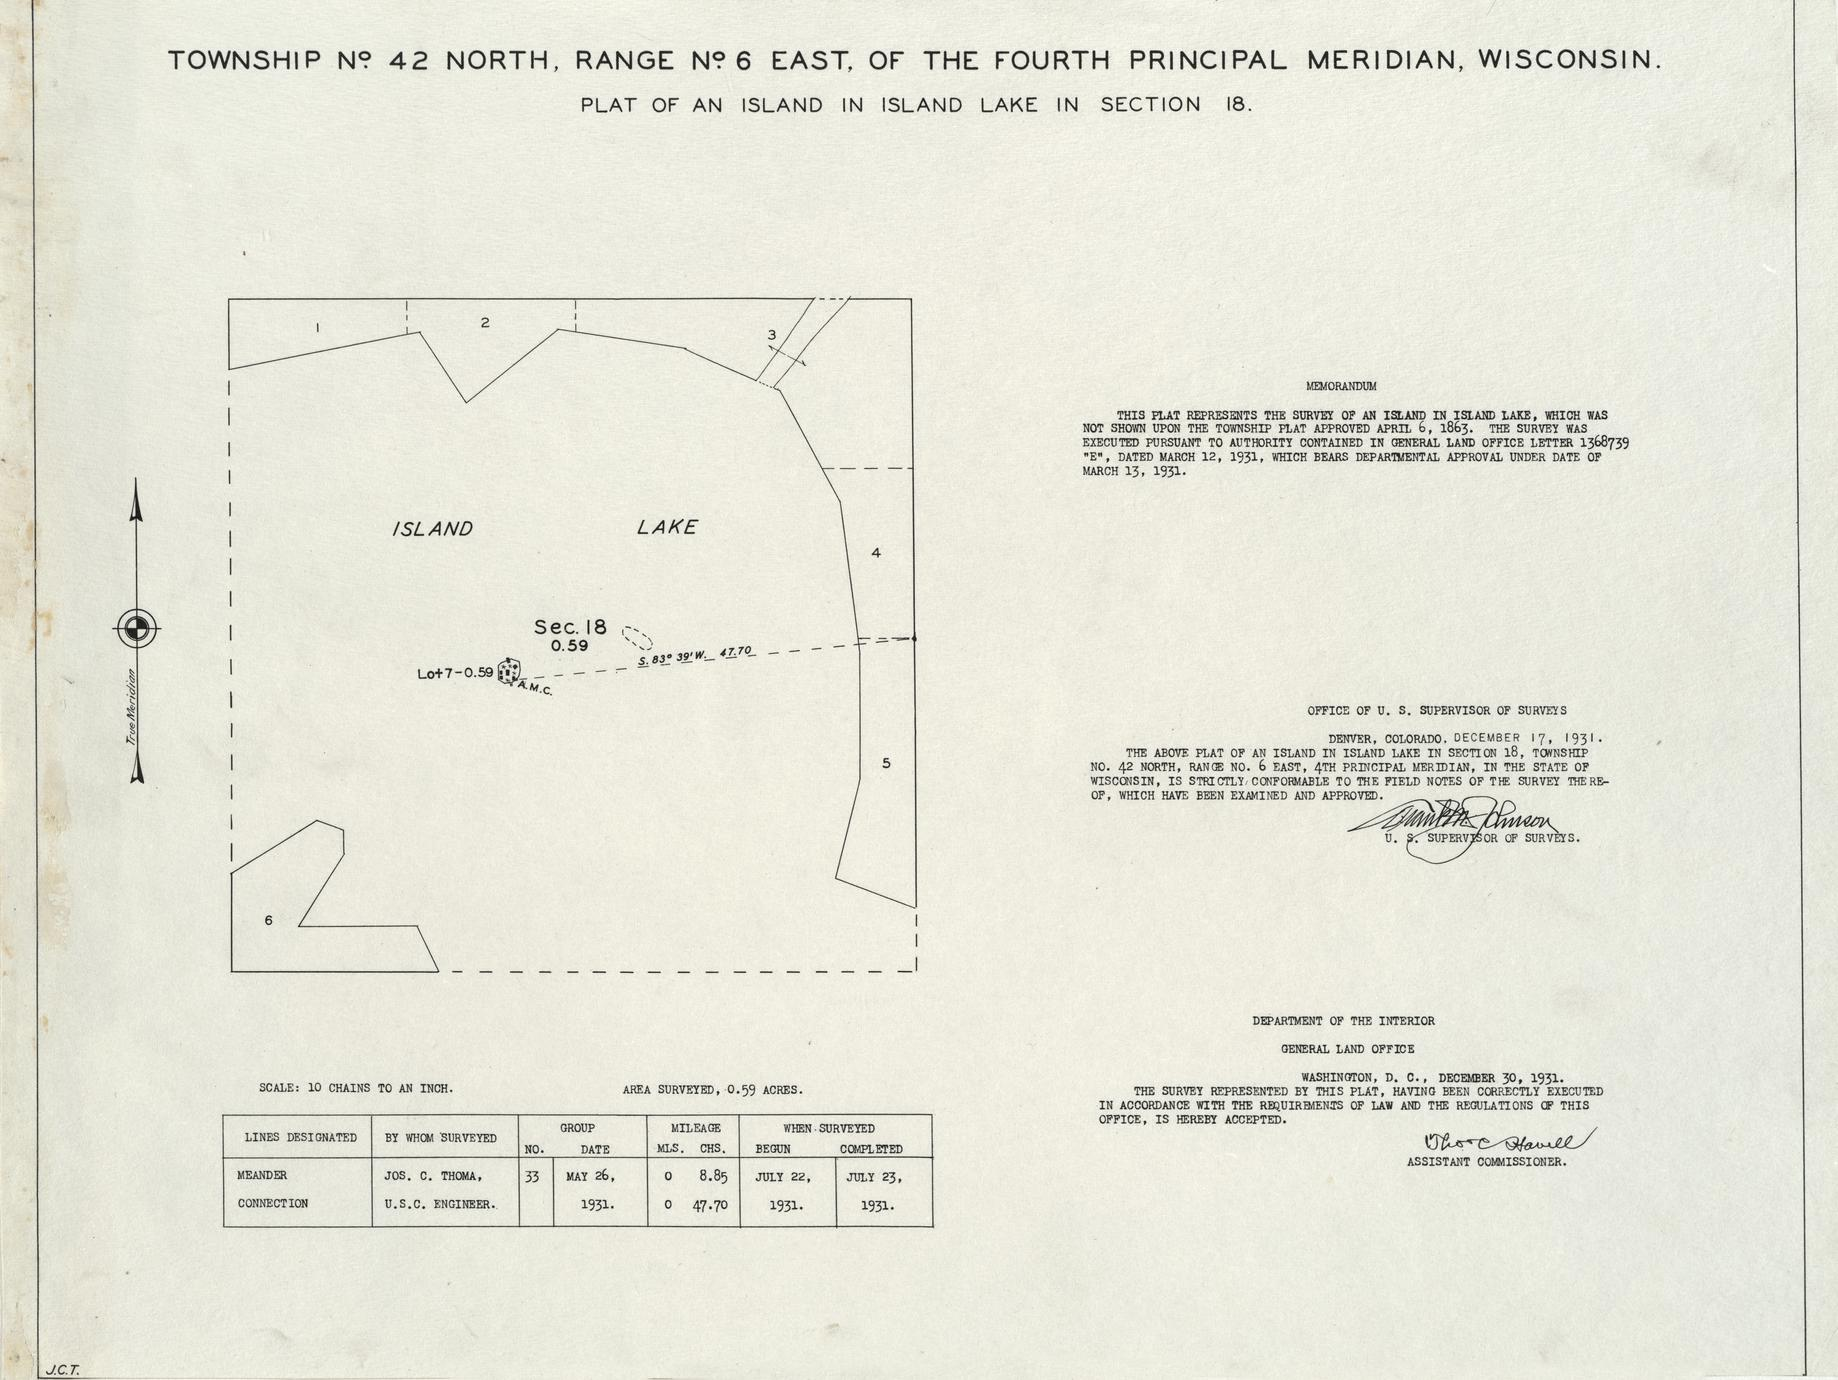 [Public Land Survey System map: Wisconsin Township 42 North, Range 06 East]